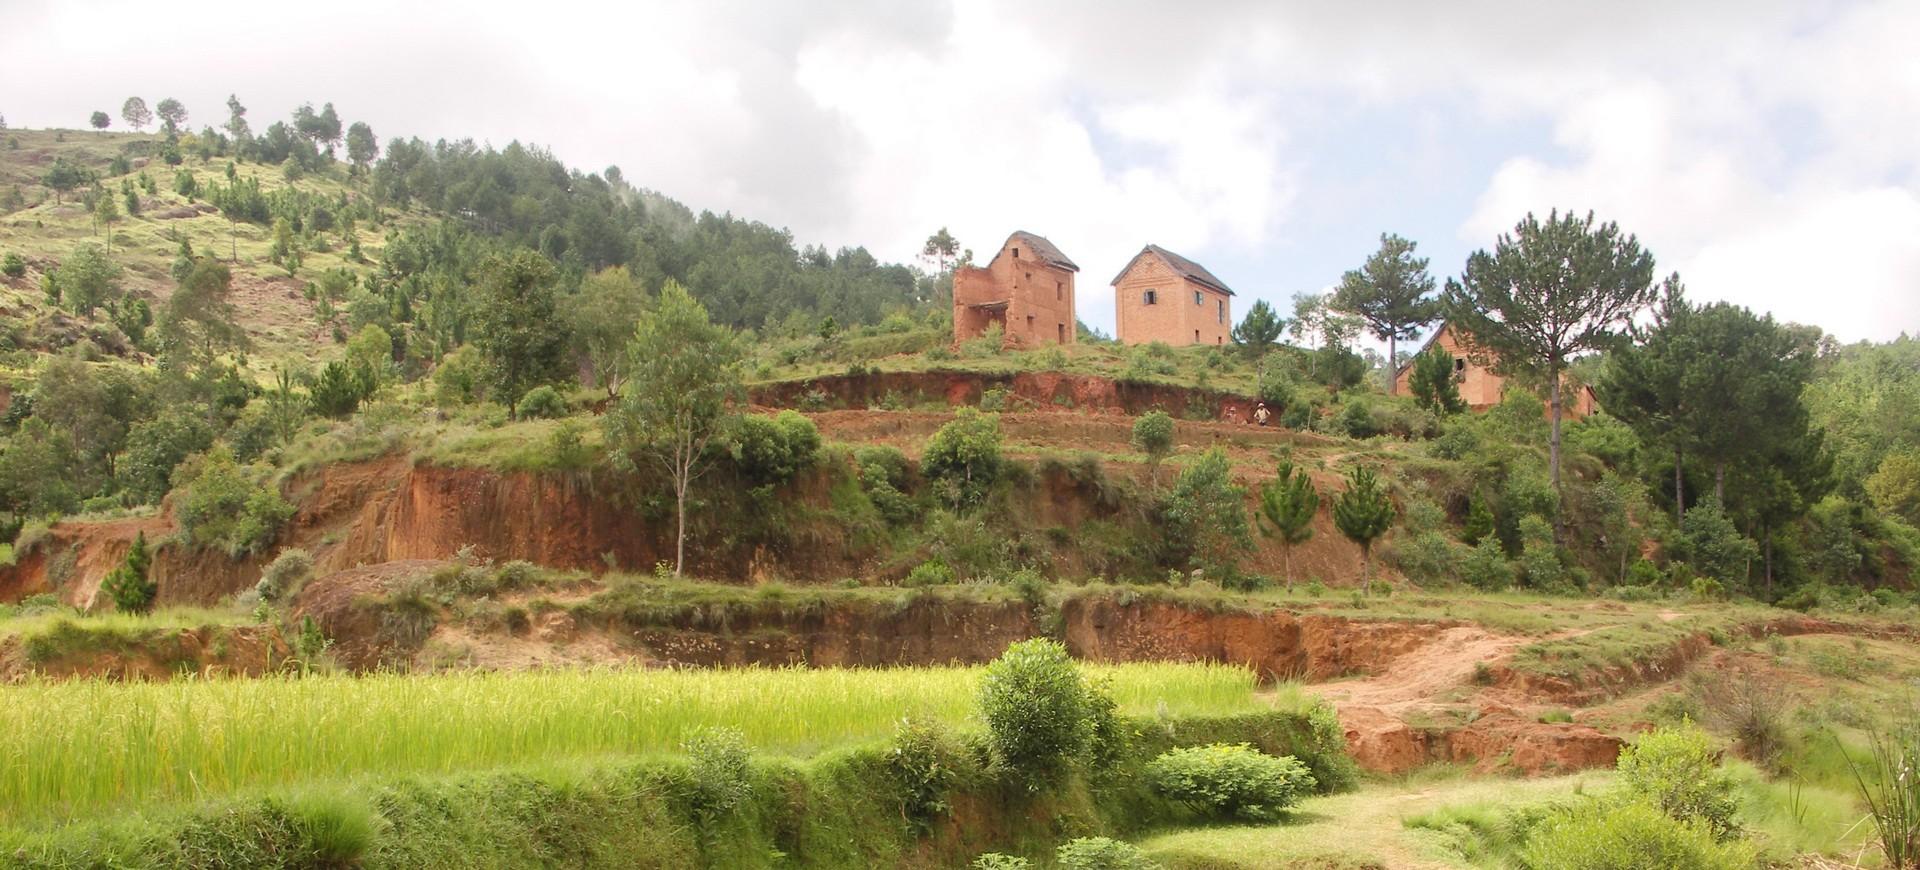 Madagascar Village des hautes terres